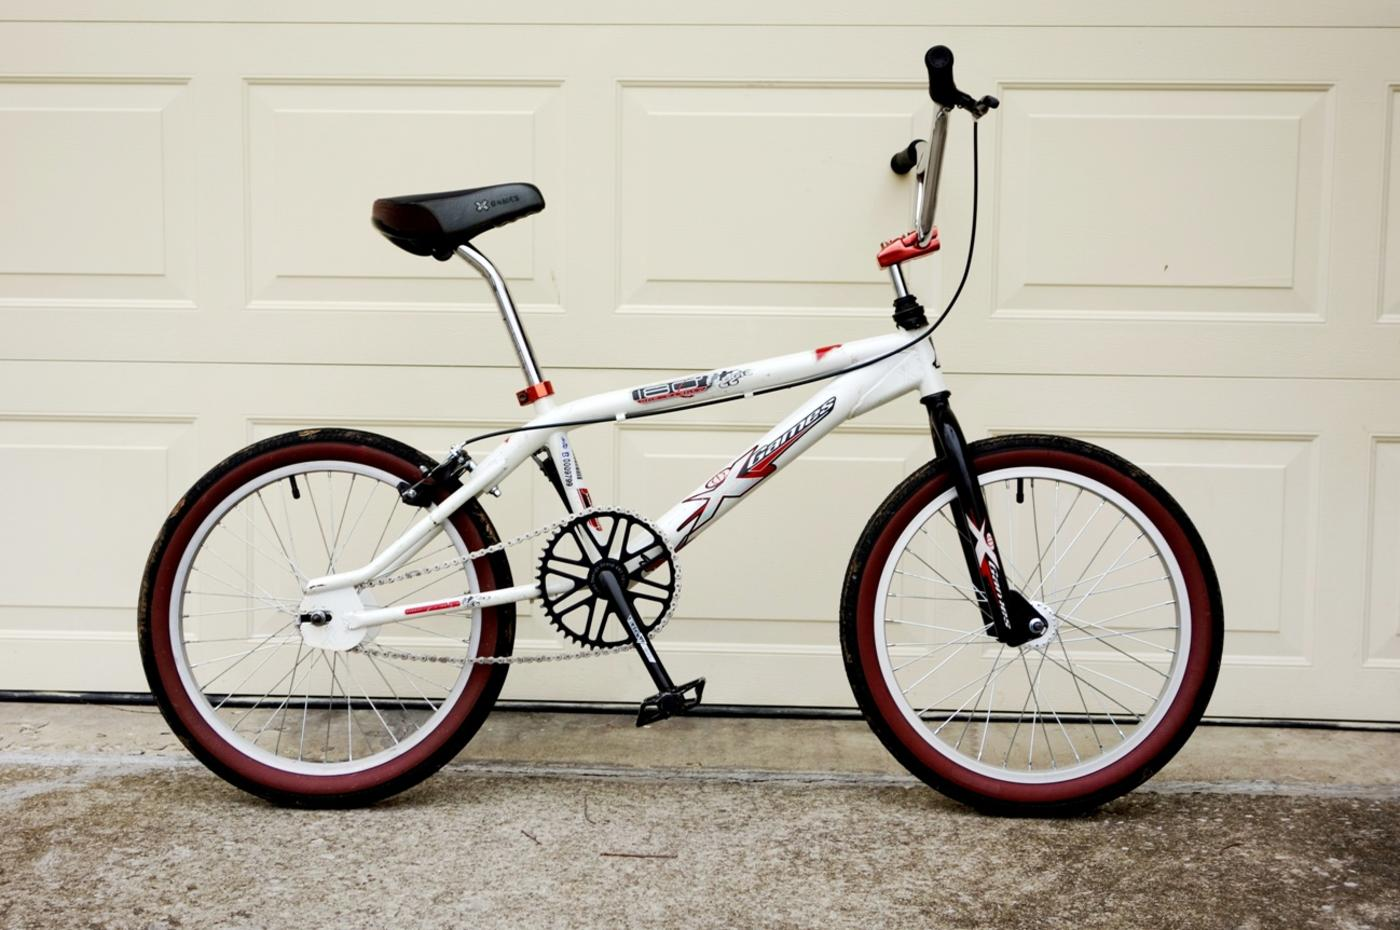 X Games Bmx Bike 2001 X Games - BMXmuse...